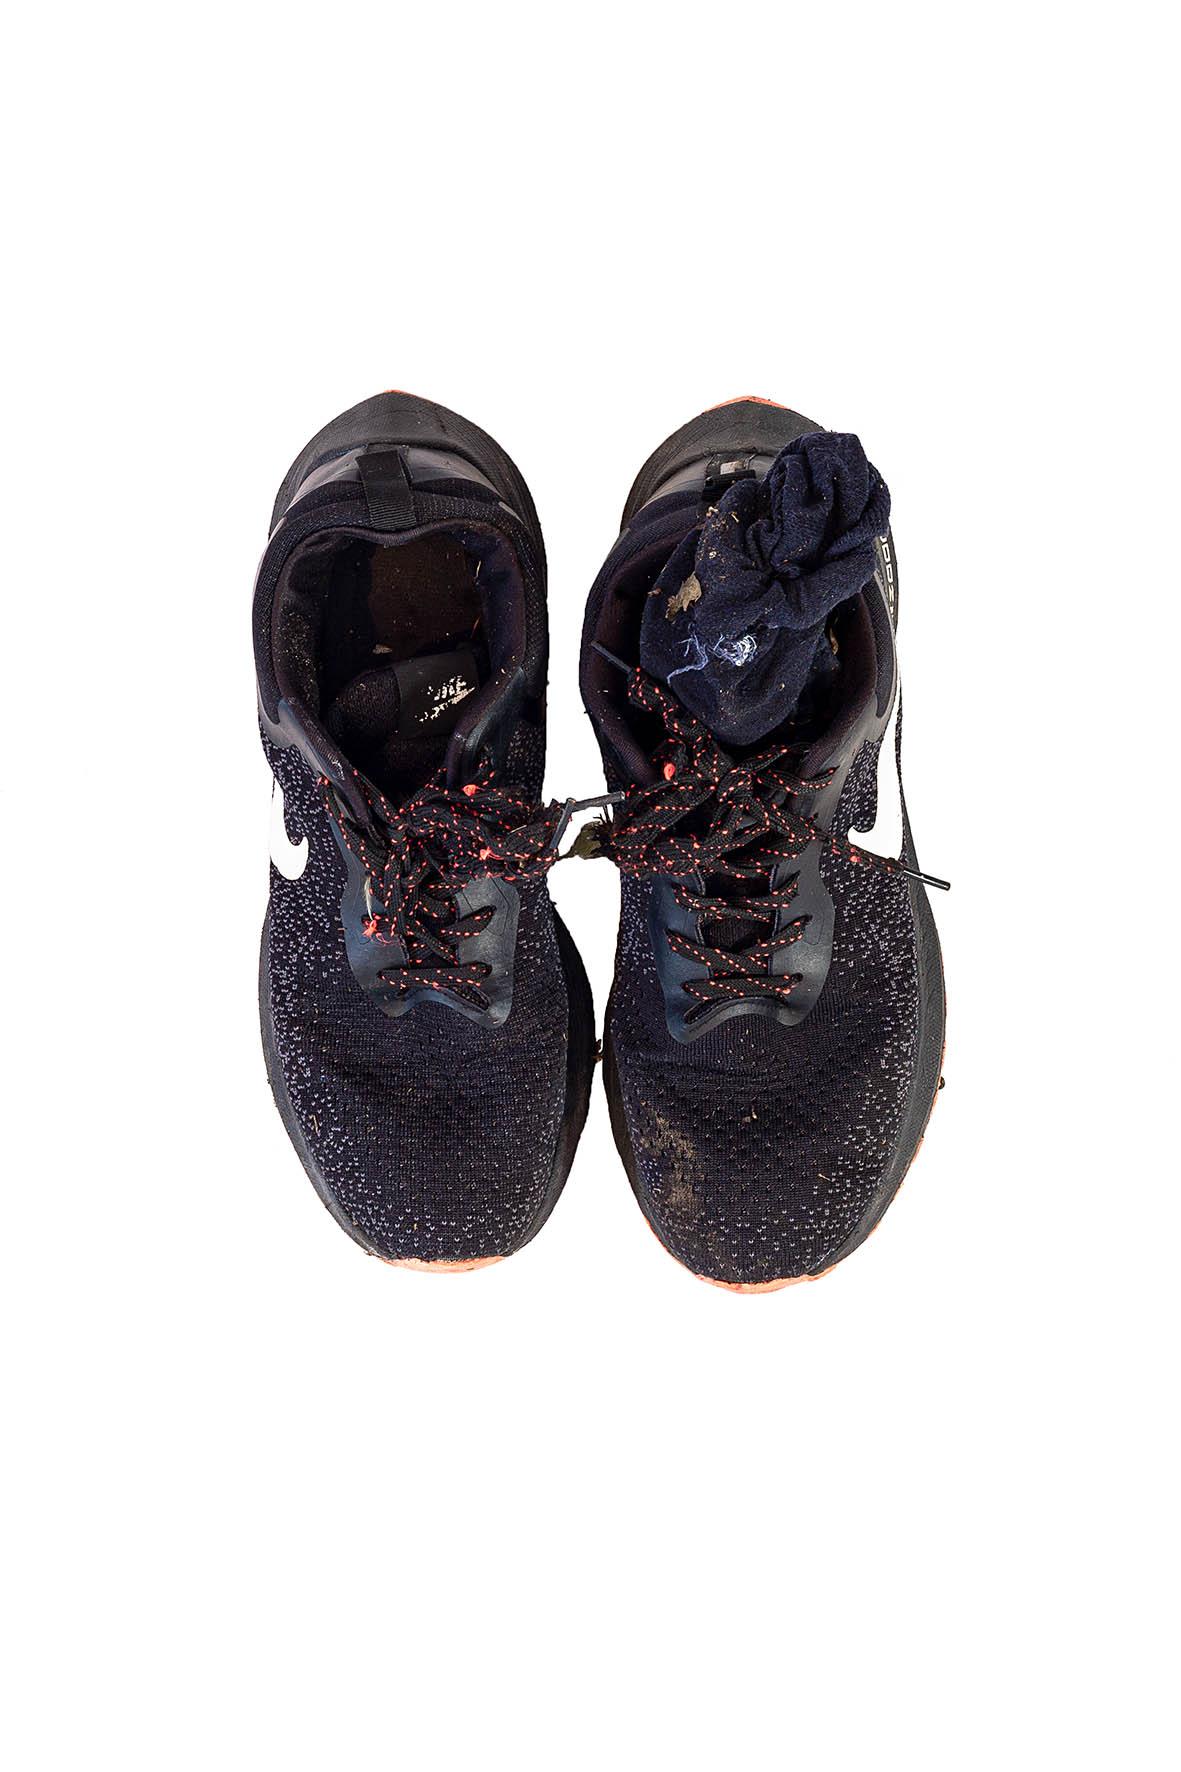 Scarpe Nike Tg.45 by ArmashirBUY IT